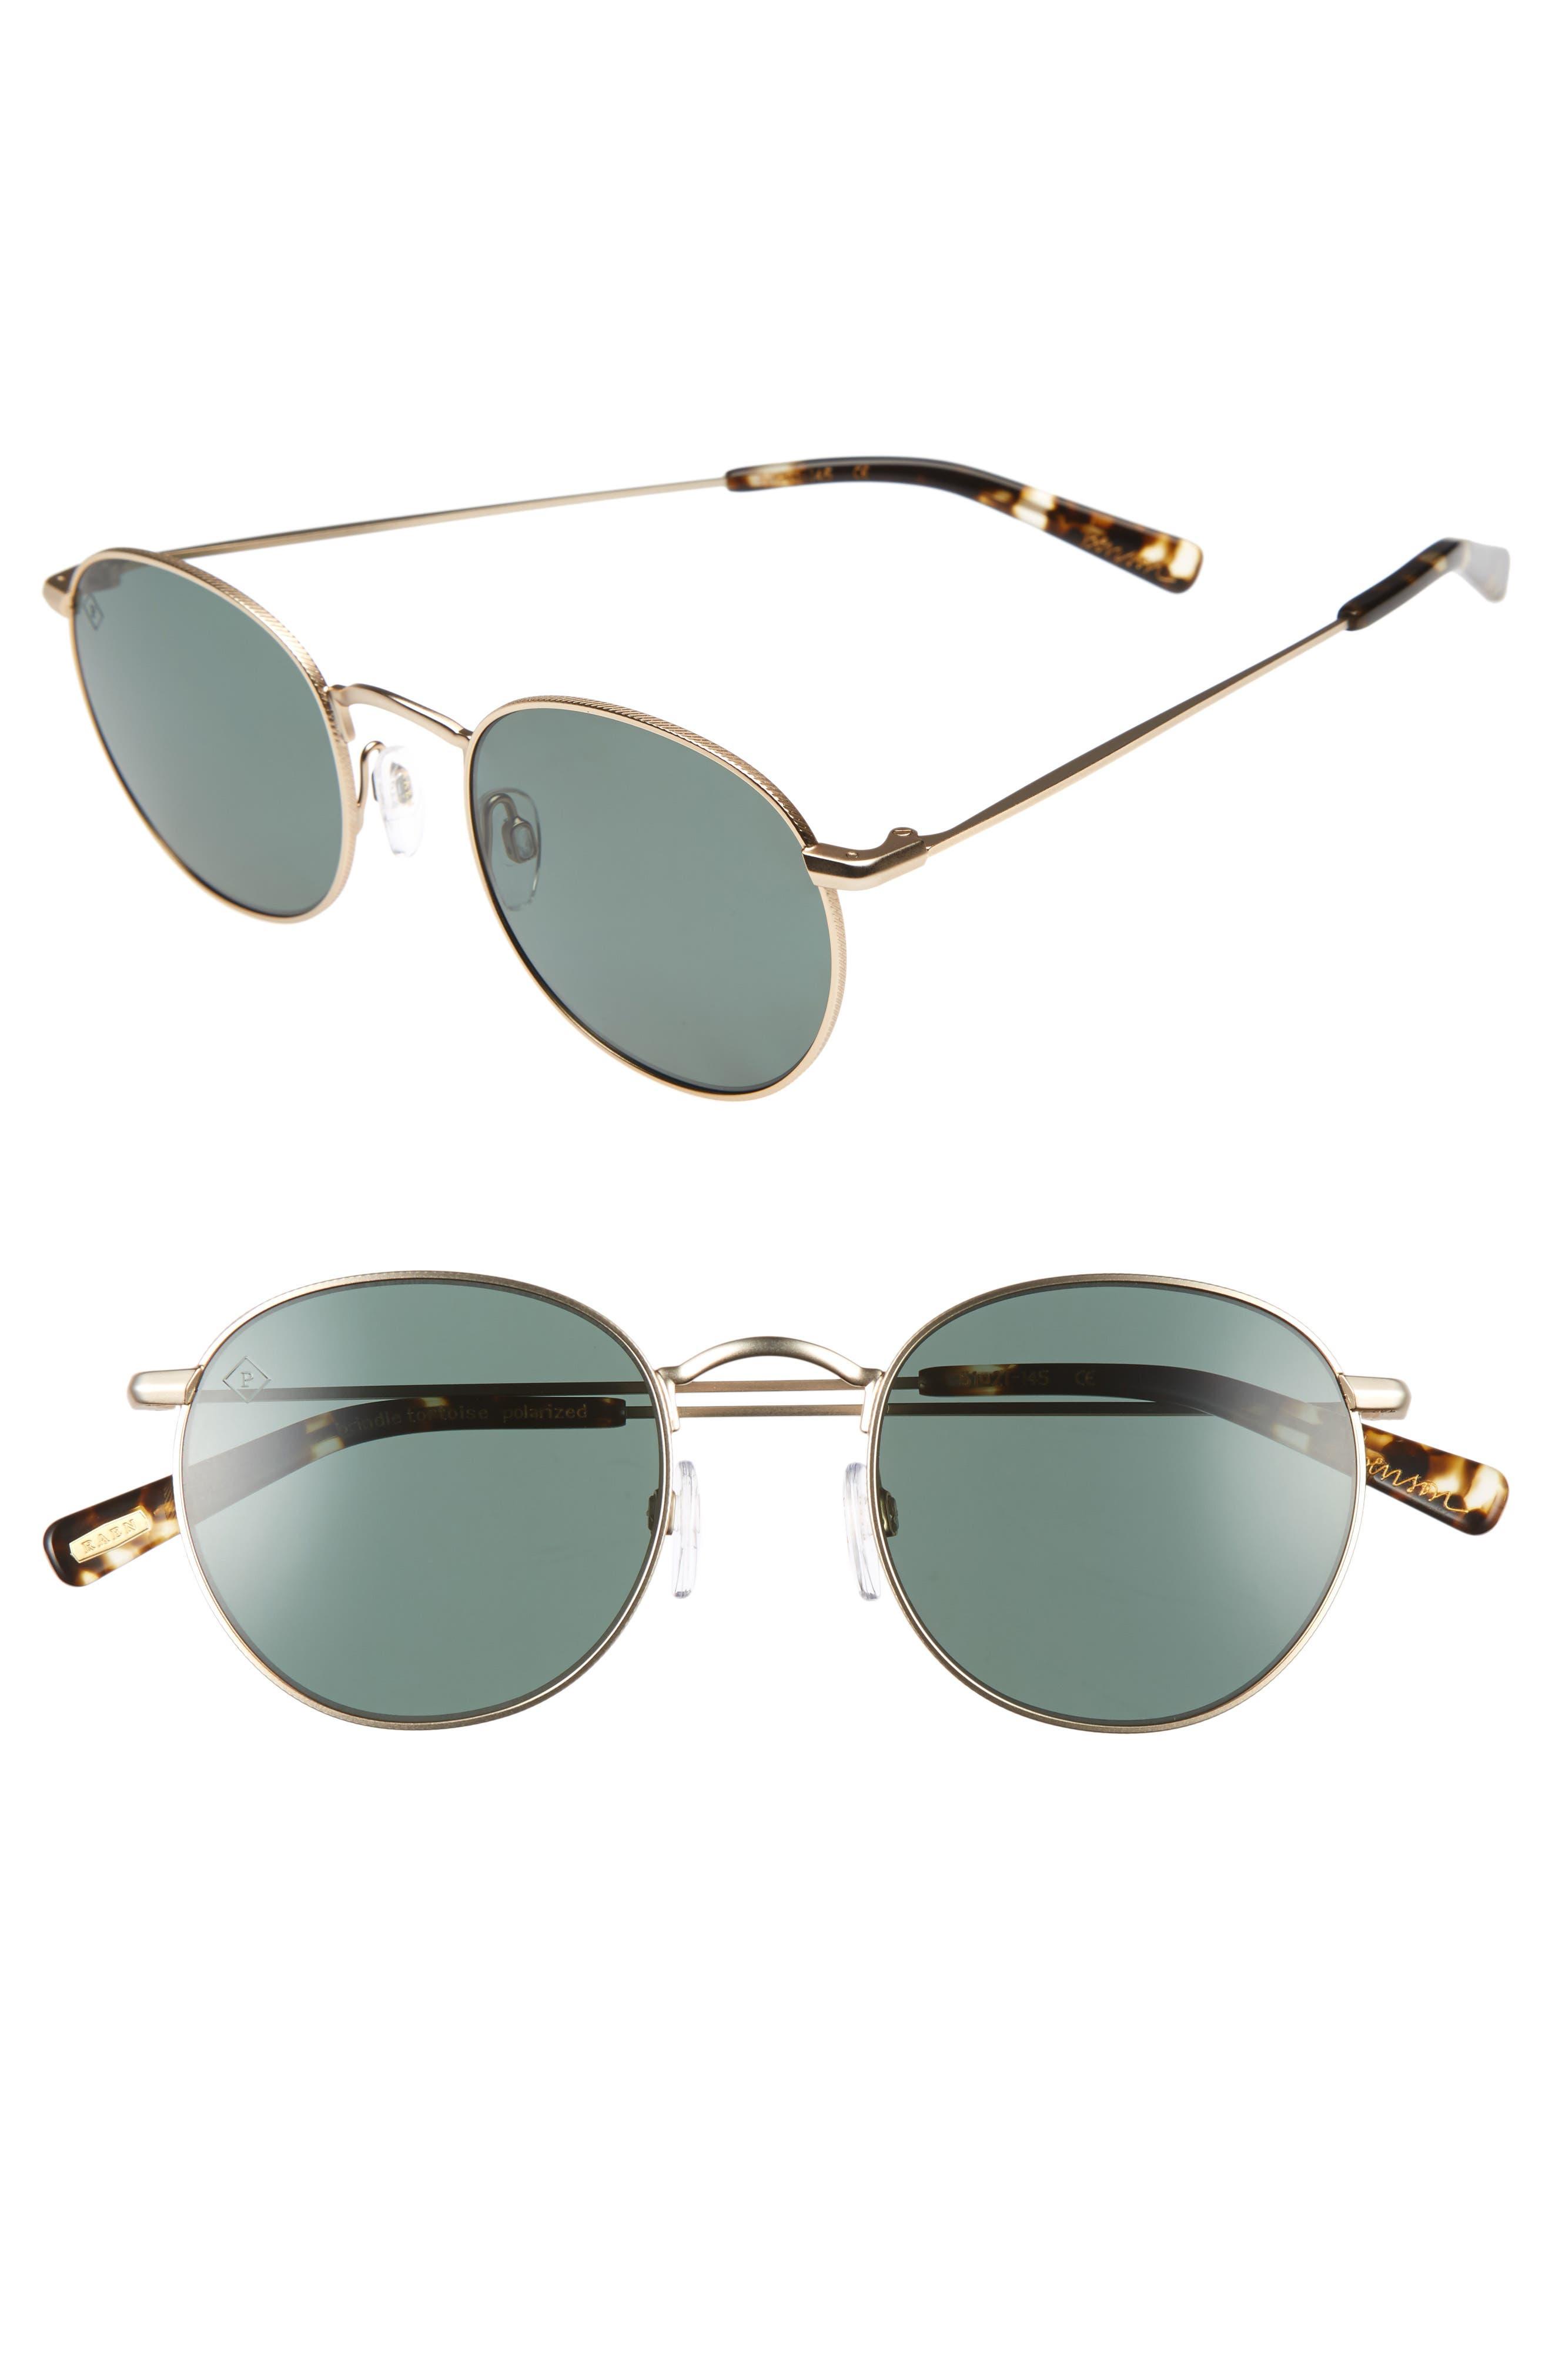 Benson 51mm Polarized Sunglasses,                             Alternate thumbnail 2, color,                             710